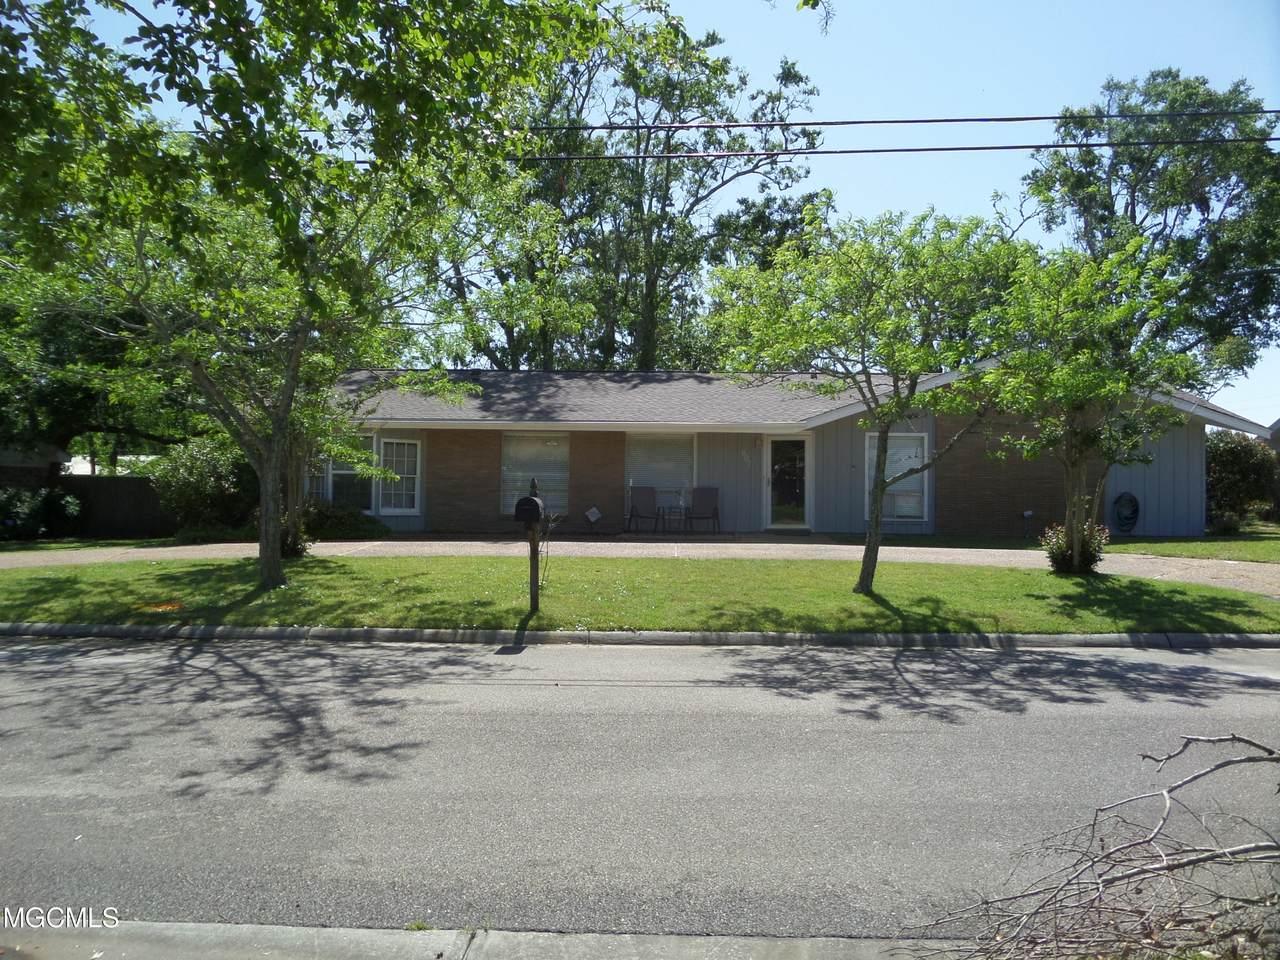 807 Mills Ave - Photo 1